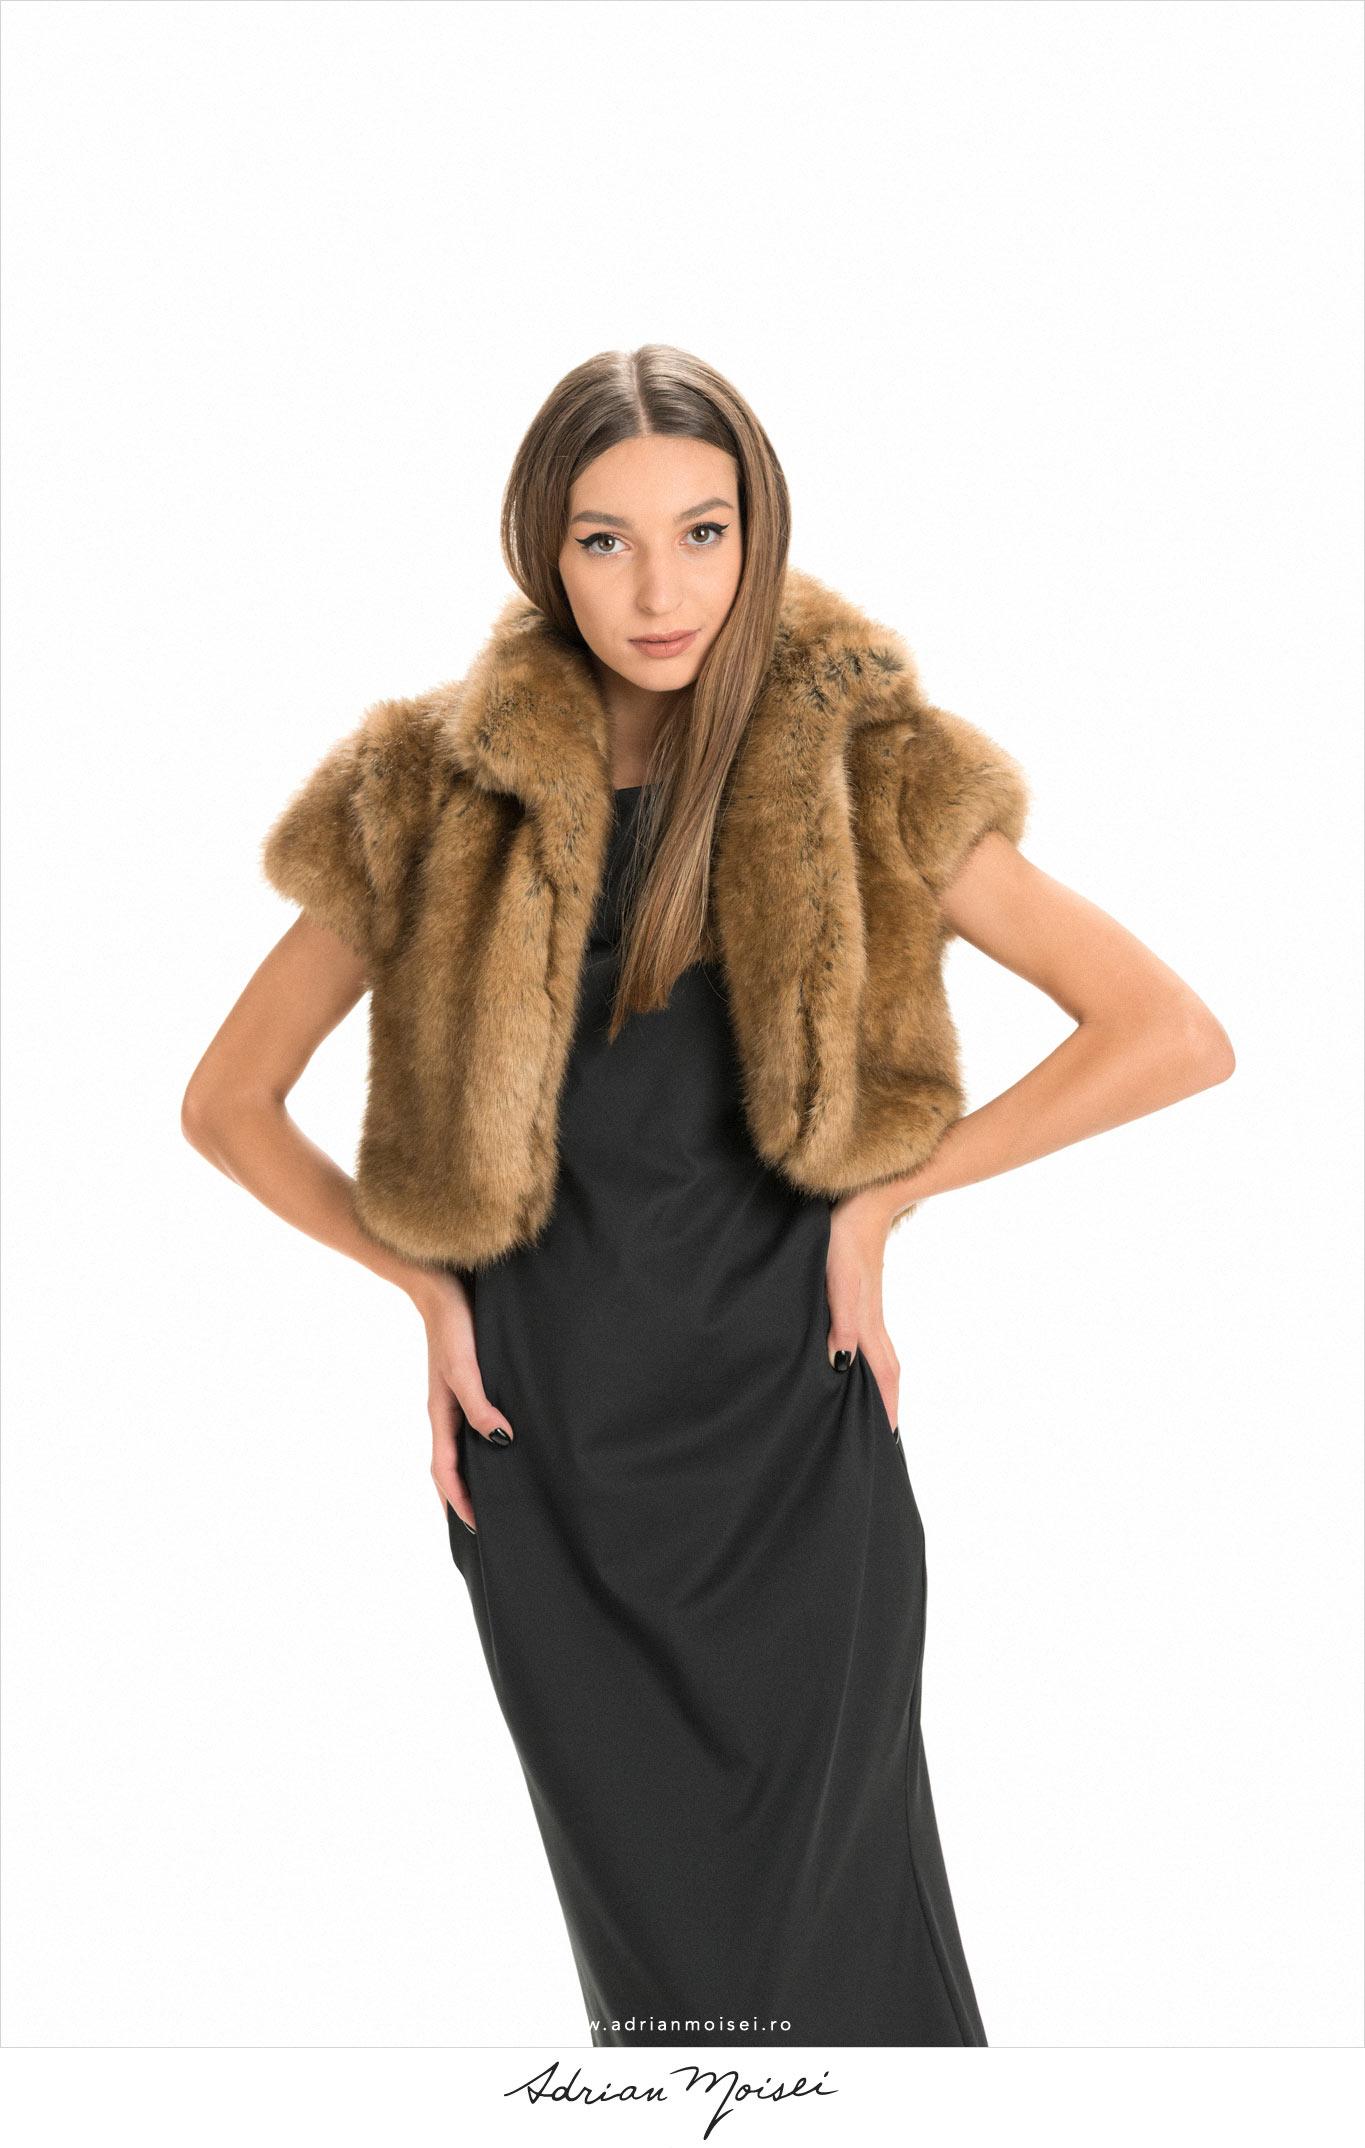 Fotograf fashion Iasi Adrian Moisei fotografie moda magazin online MarySten Agness